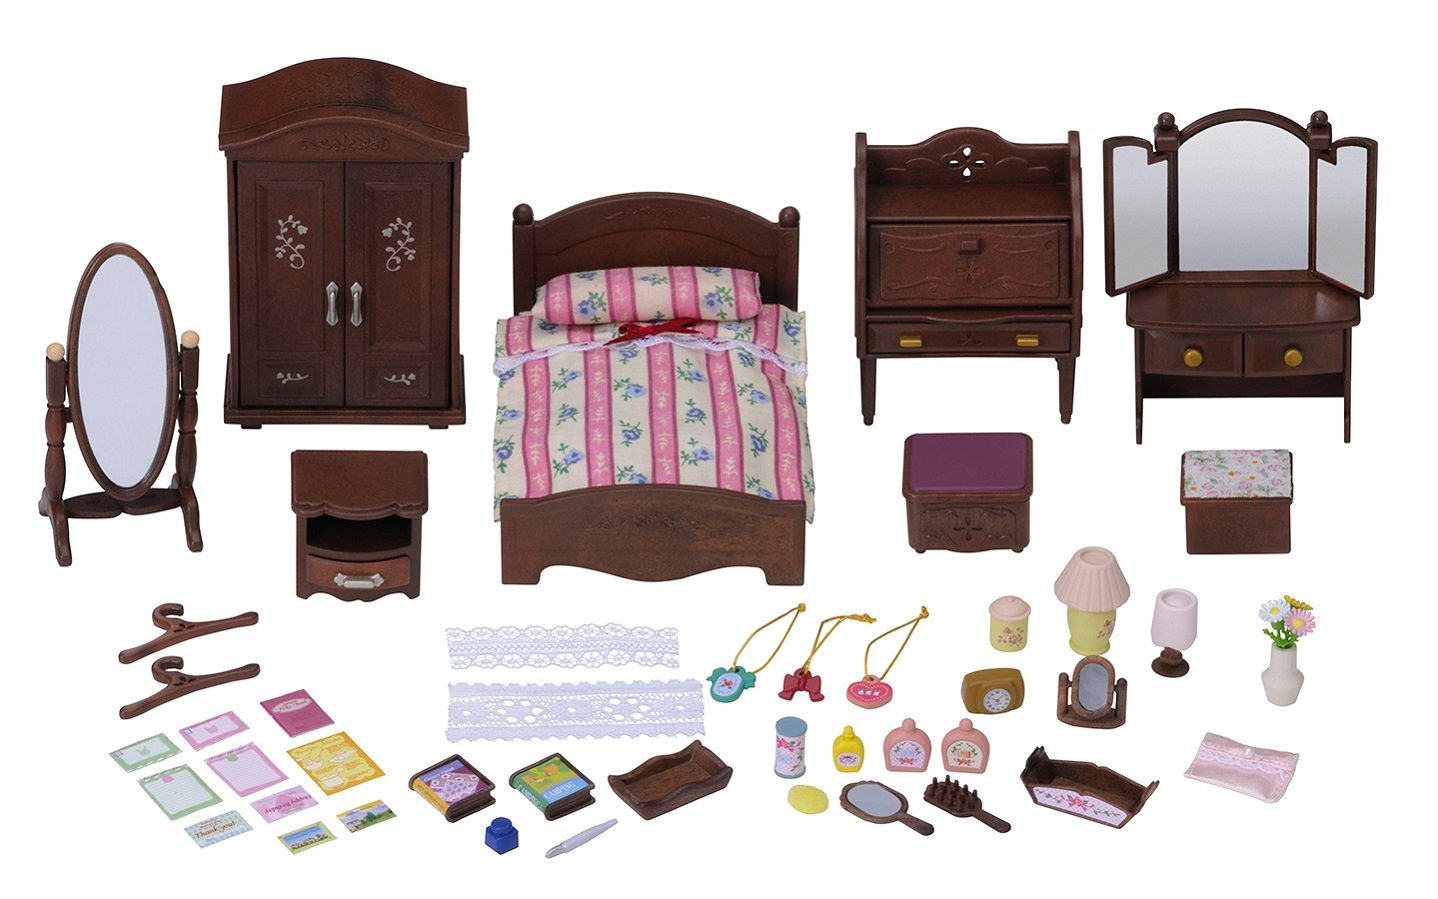 Sylvanian families bedroom set for 0 apr bedroom furniture